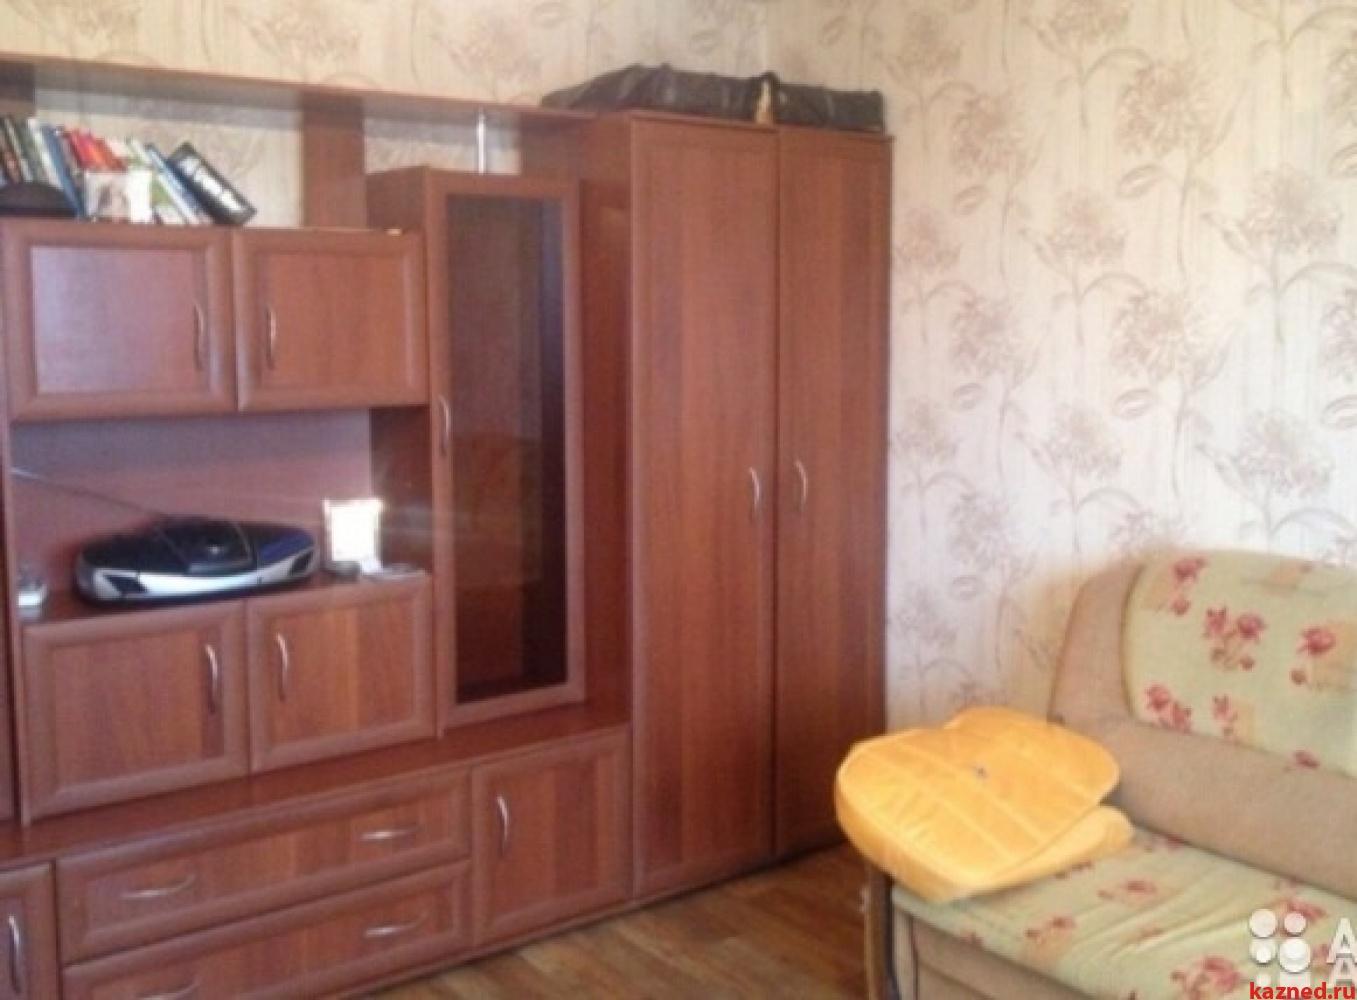 Продажа 3-к квартиры Фучика 44, 68 м²  (миниатюра №1)